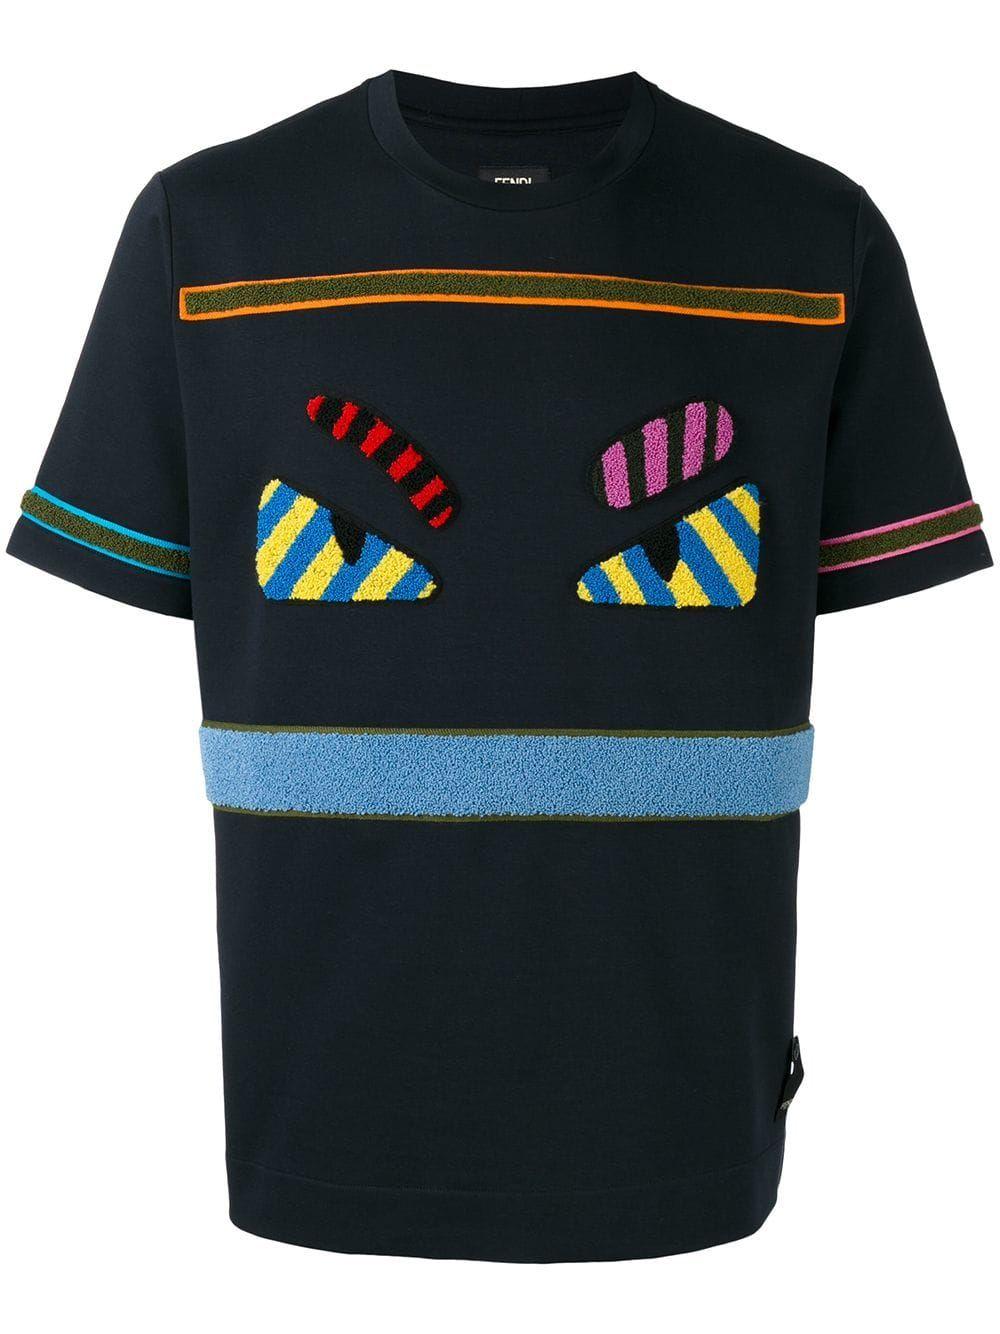 b91ef13e8692 FENDI FENDI BAG BUGS T-SHIRT - BLACK.  fendi  cloth